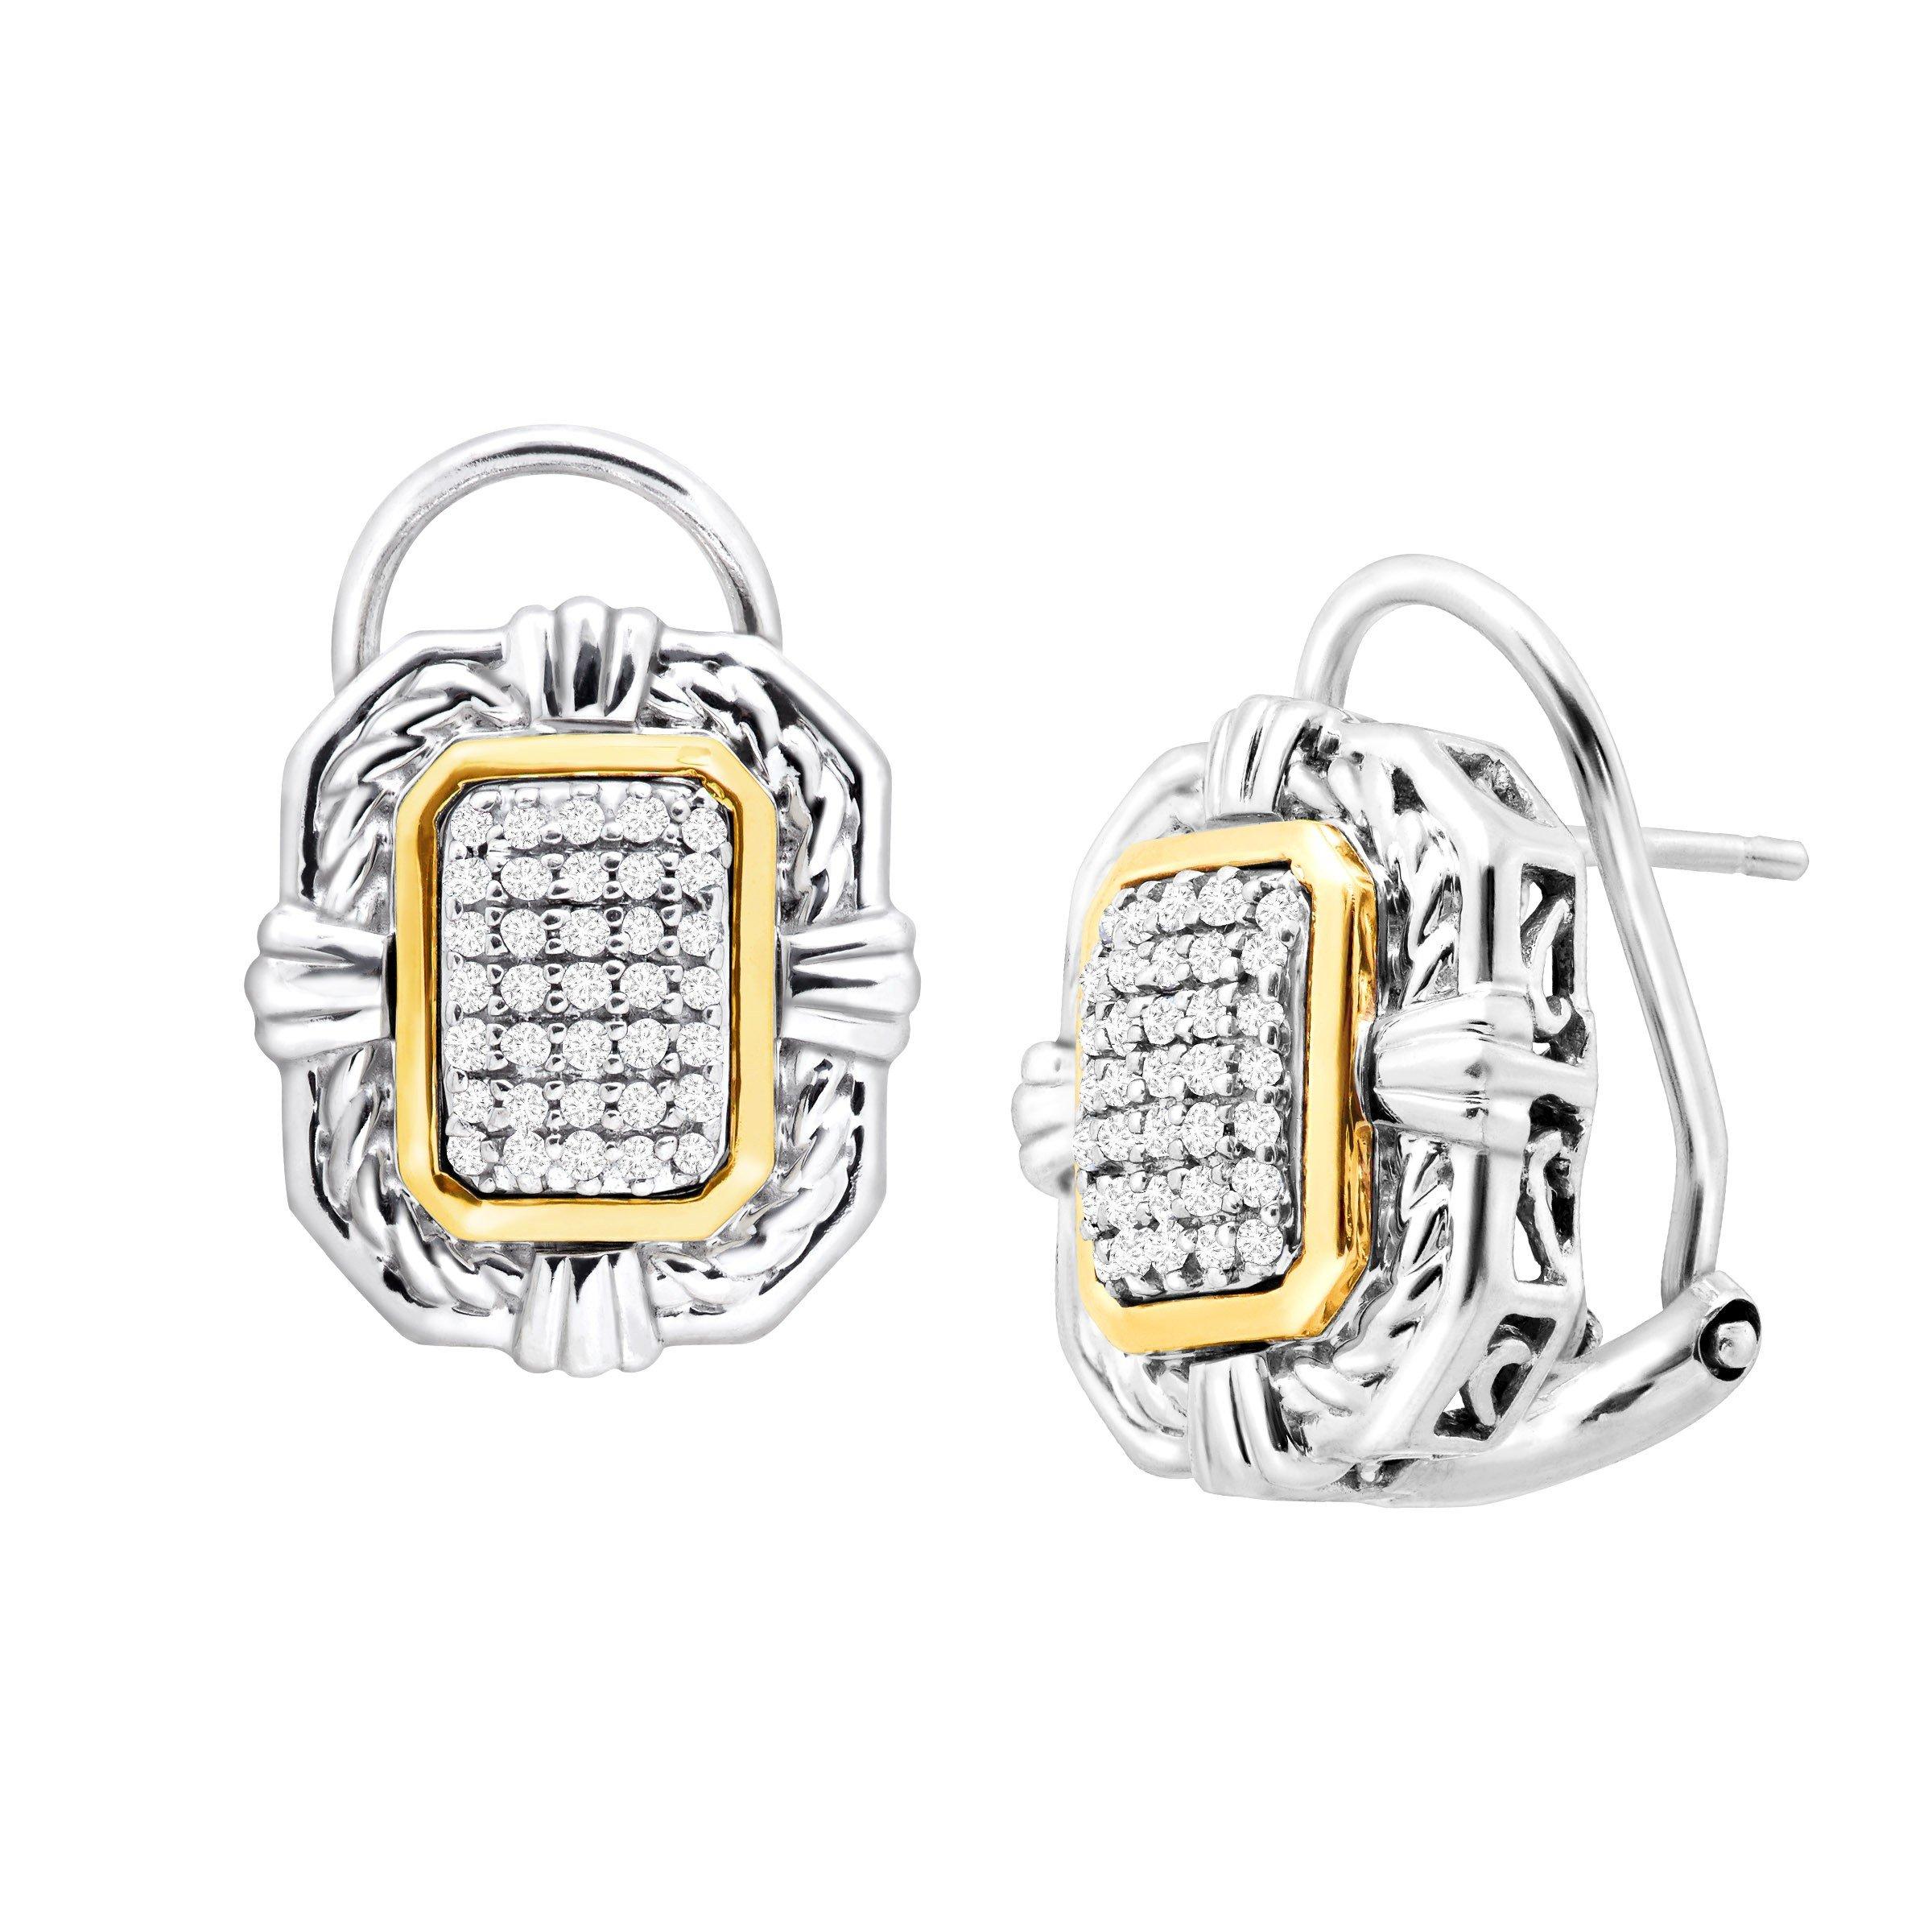 1/5 ct Diamond Braided Frame Stud Earrings in Sterling Silver & 14K Gold